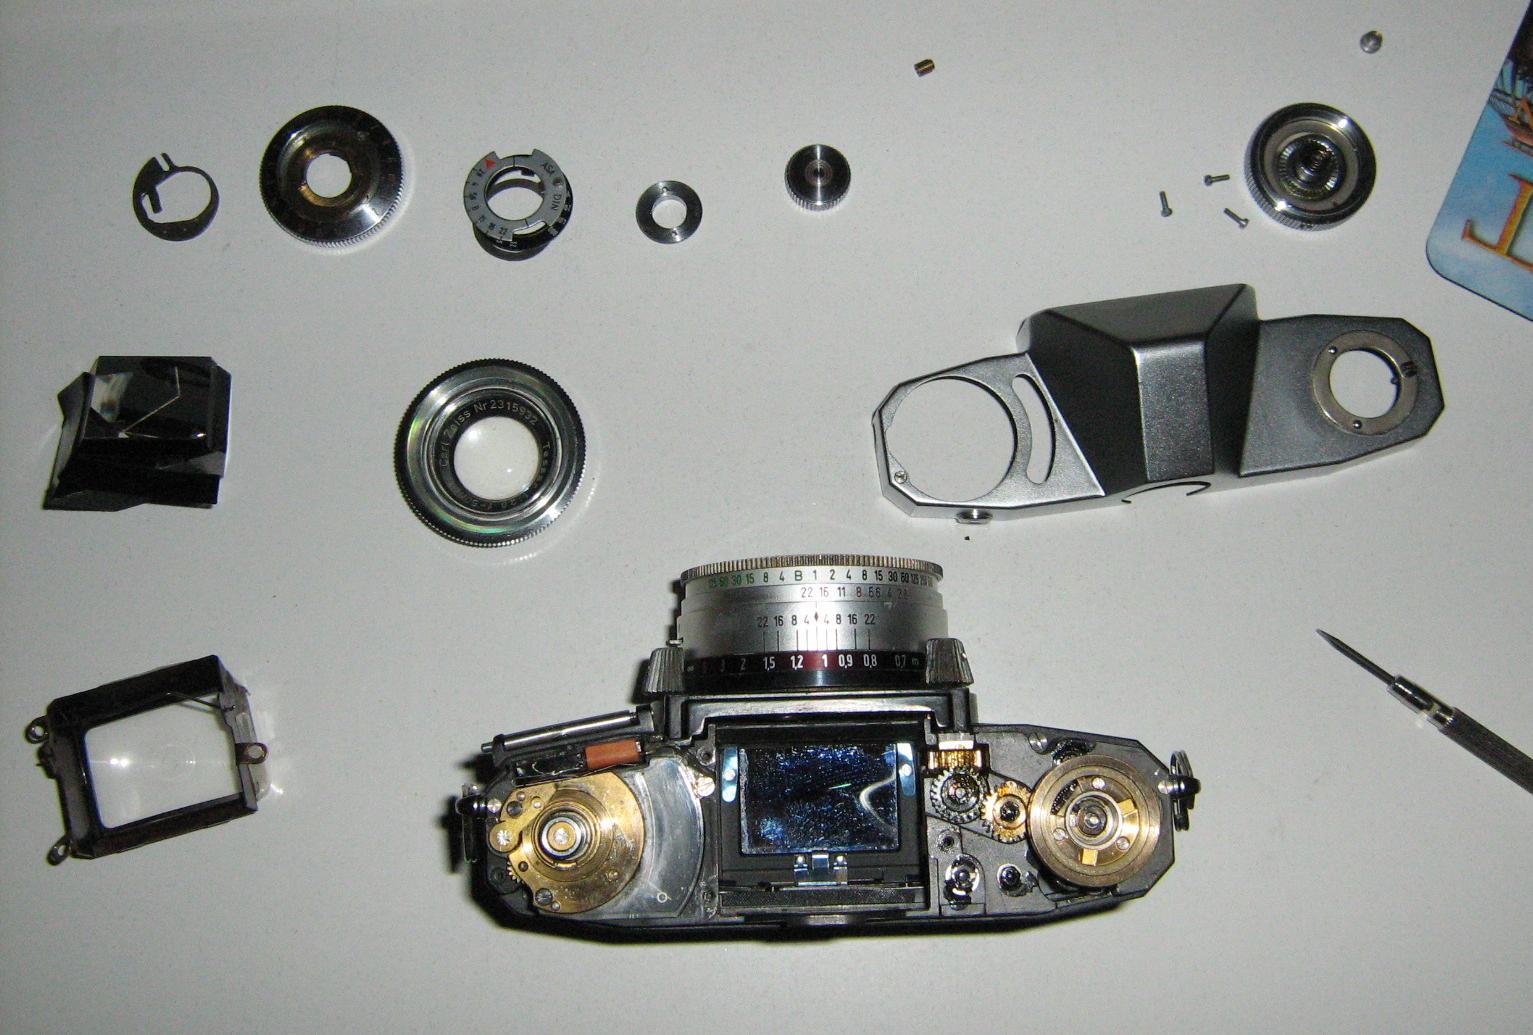 Zeiss-Ikon Contaflex IV | Analoge Fotokameras, Objektive